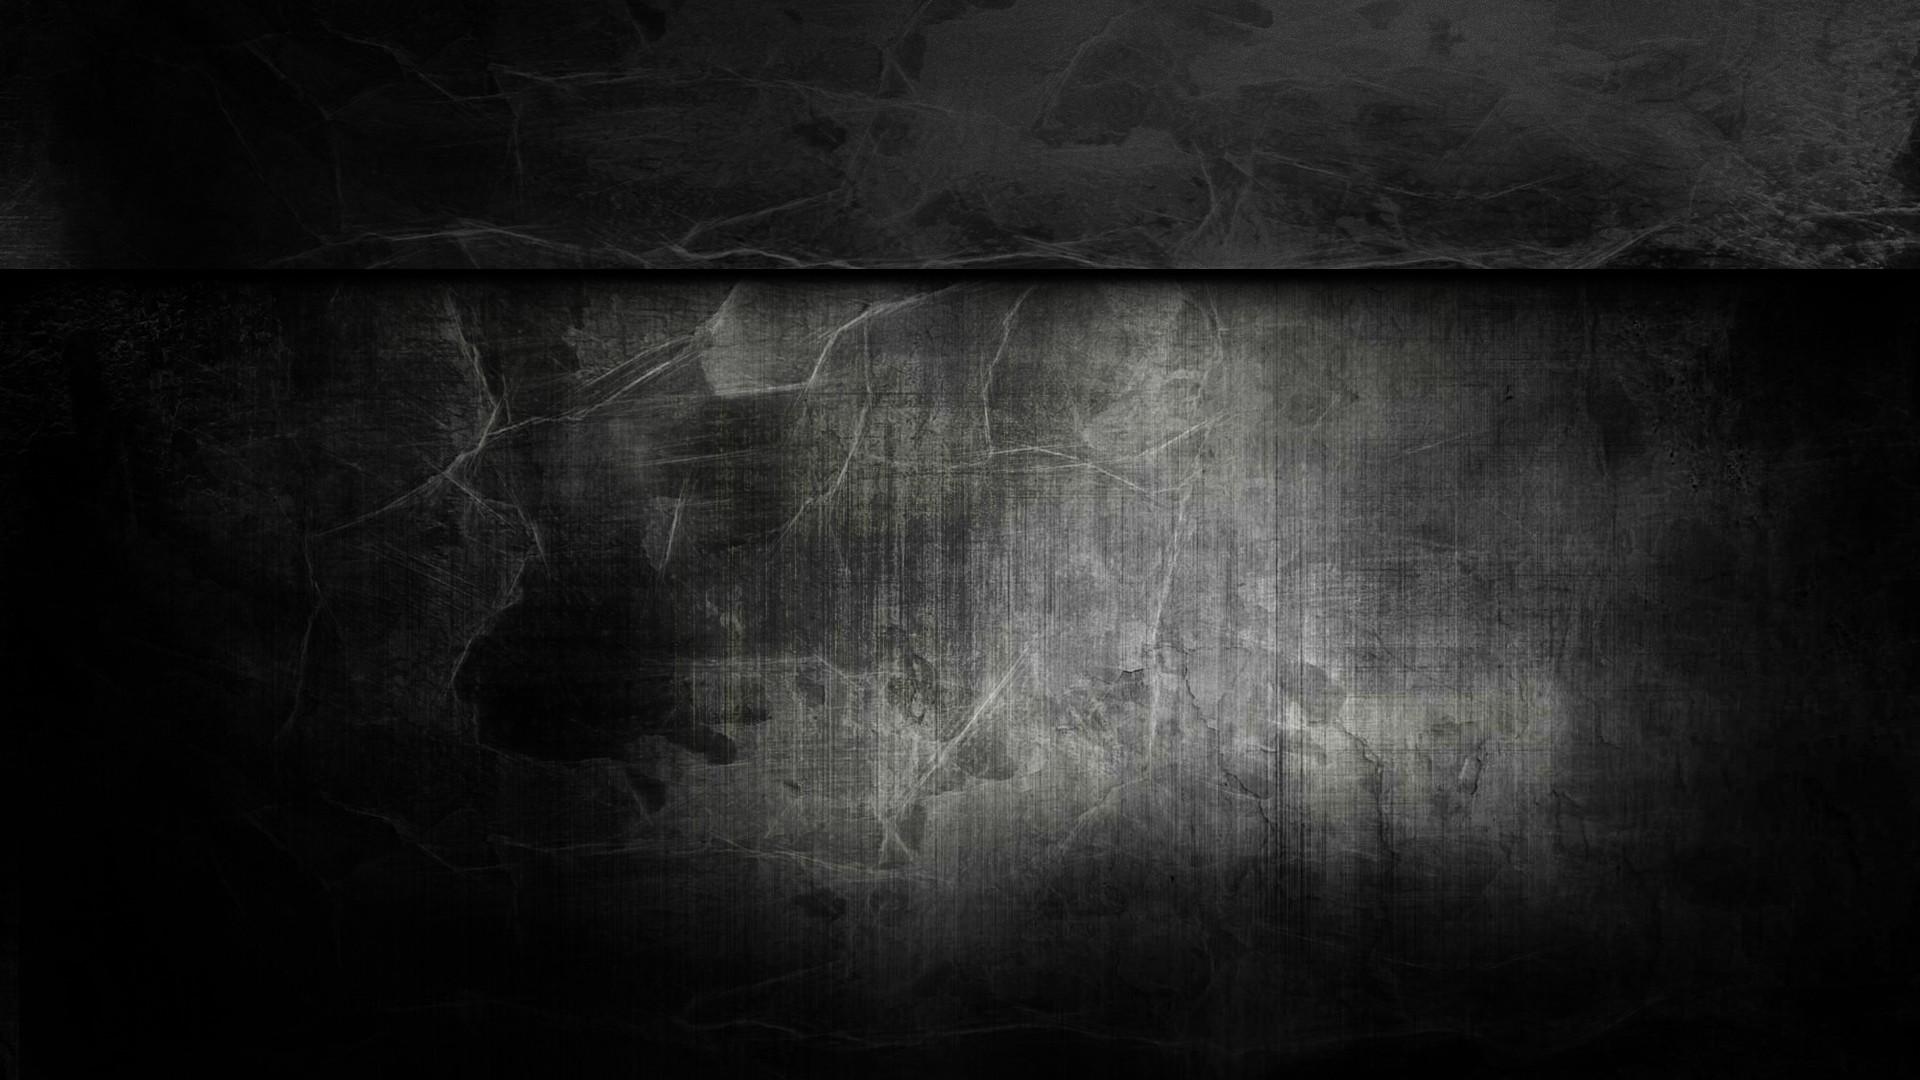 abstract, black, dark, grunge, patterns, surface, templates ...